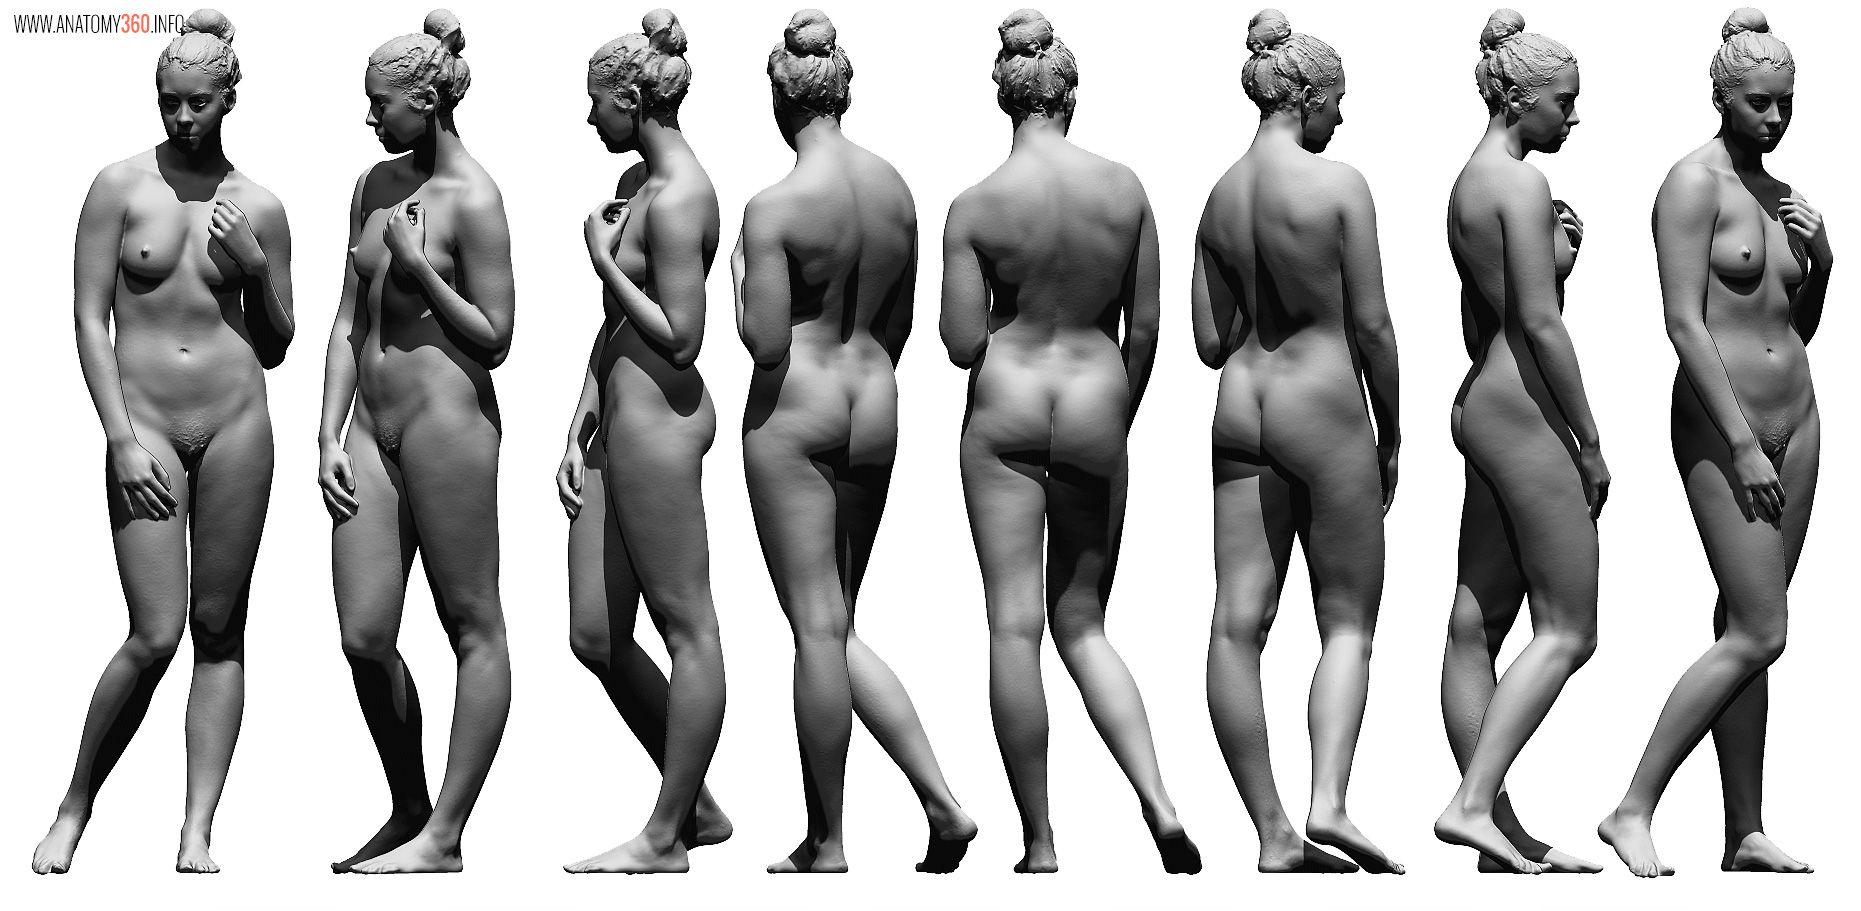 1.jpg (1861×911) | 3d reference - model sheets | Pinterest | Anatomy ...